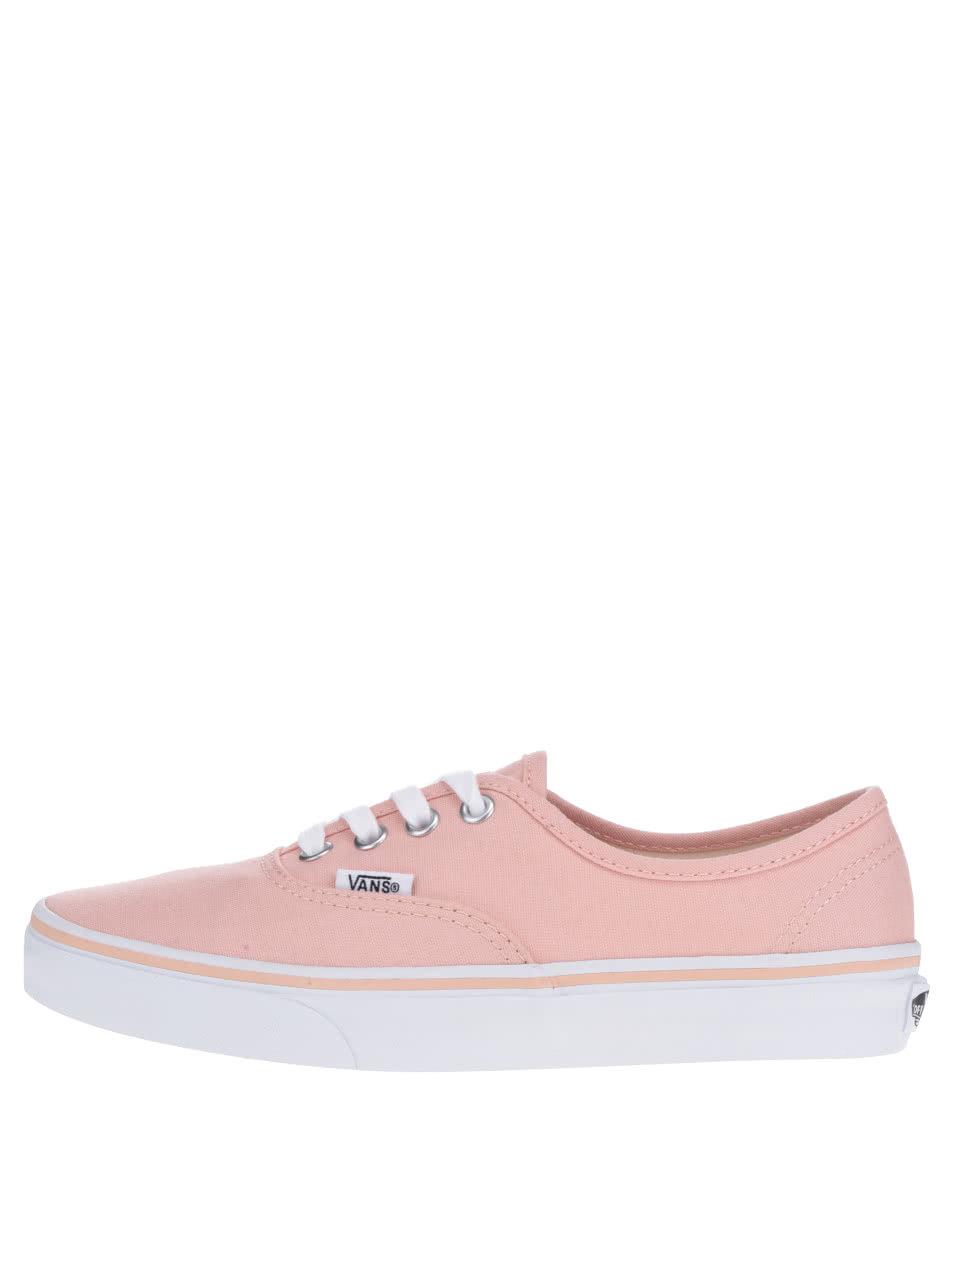 Světle růžové dámské tenisky VANS Authentic ... b665f1bc49b